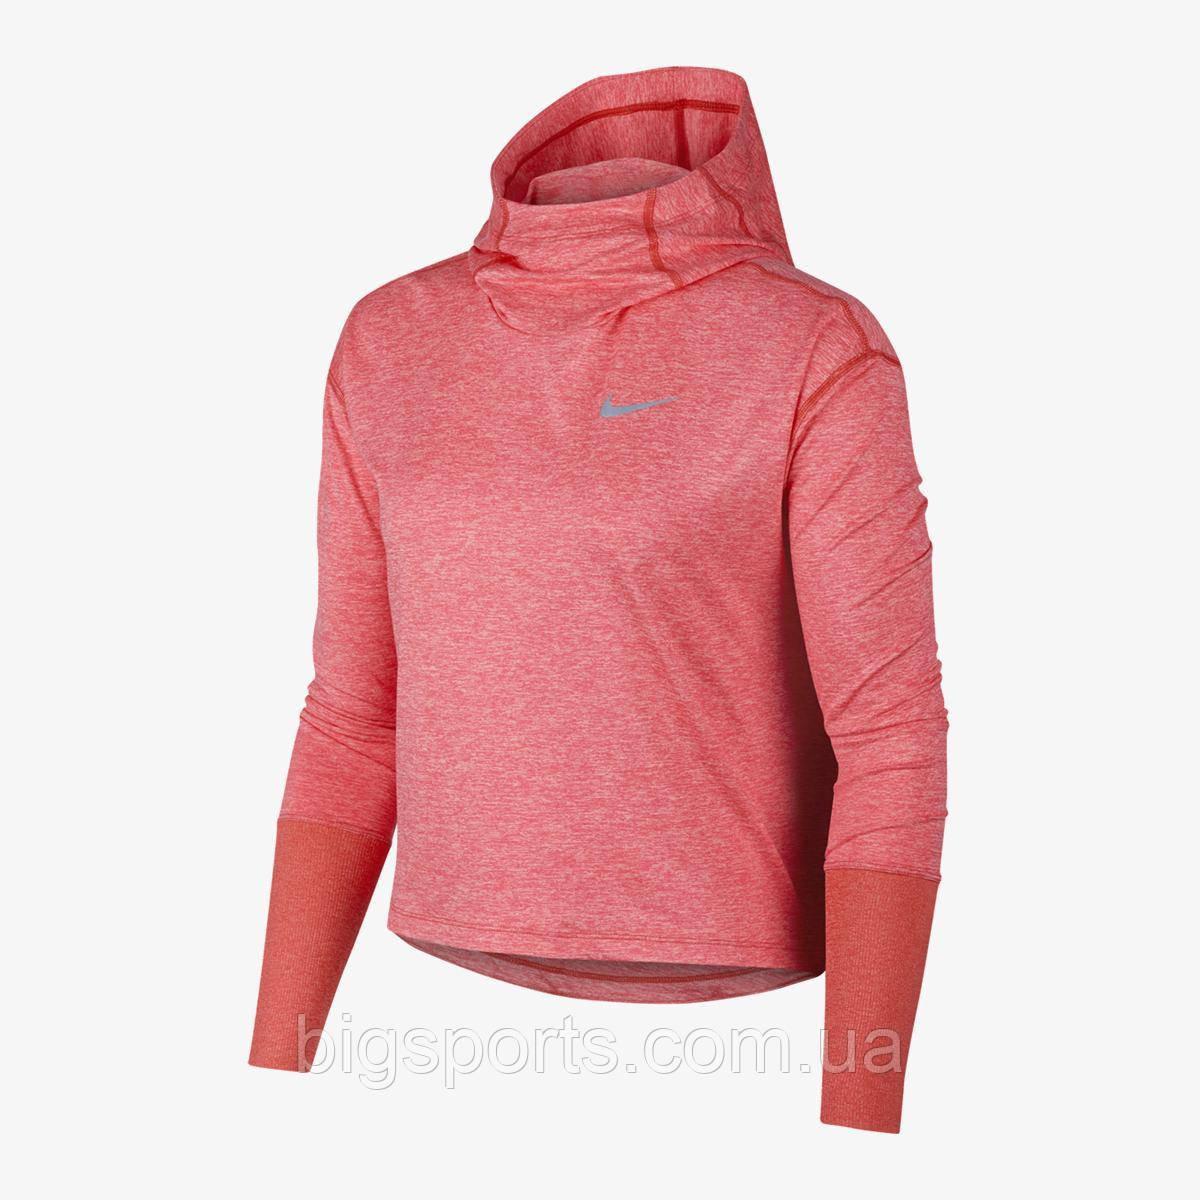 99e959ae Кофта жен. Nike W Nk Elmnt Hoodie (арт. AJ8725-850), цена 1 690 грн ...